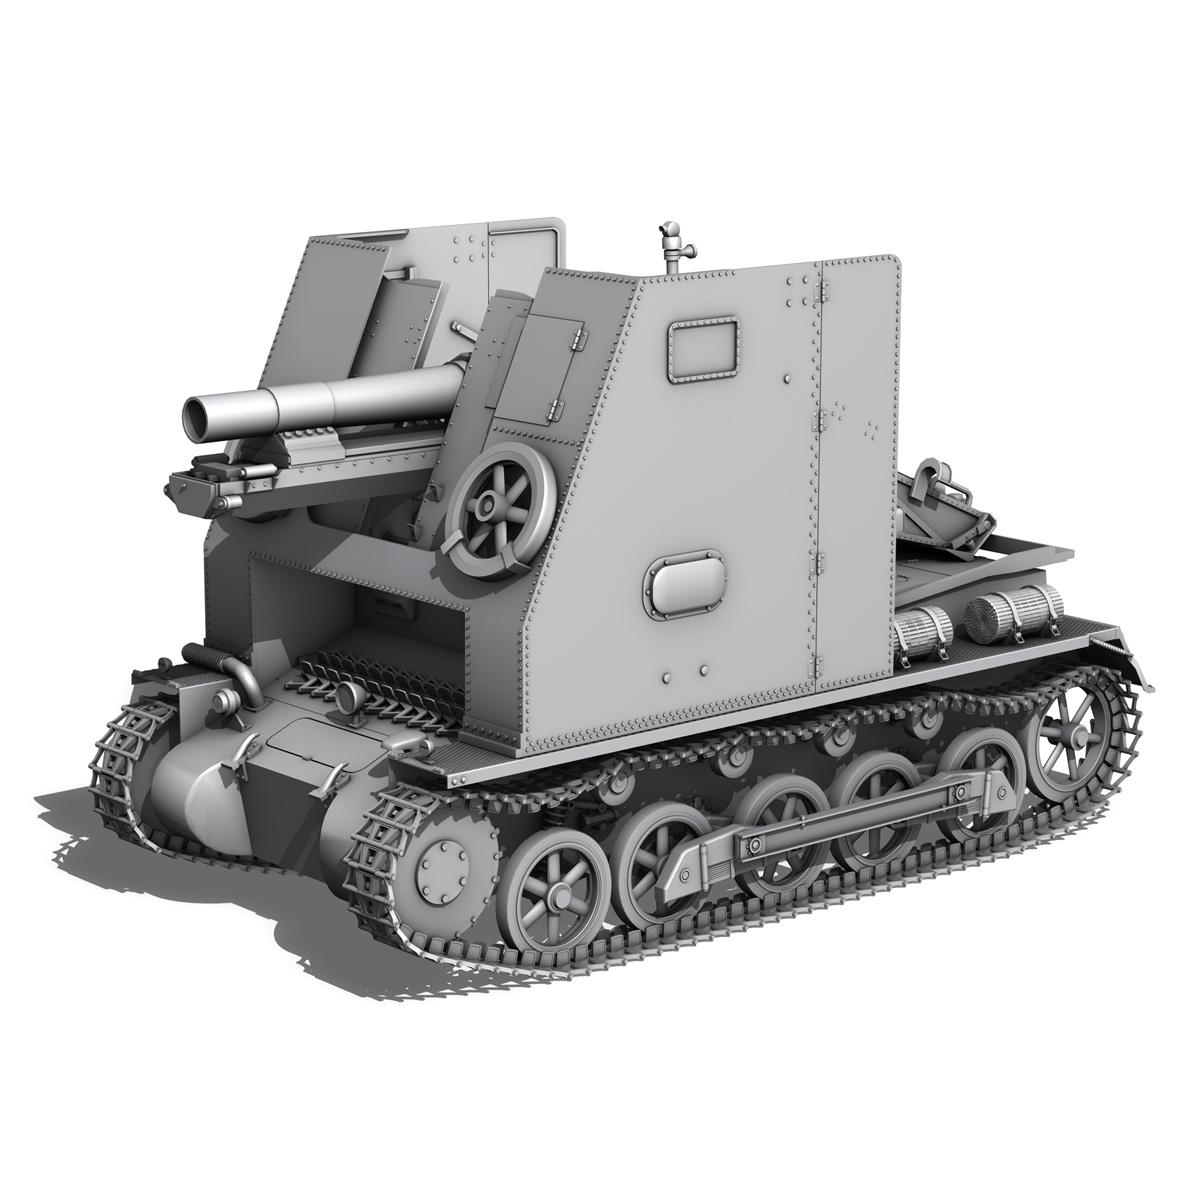 sd.kfz 101 – sturmpanzer 1 – bison 3d model 3ds fbx c4d lwo obj 189272